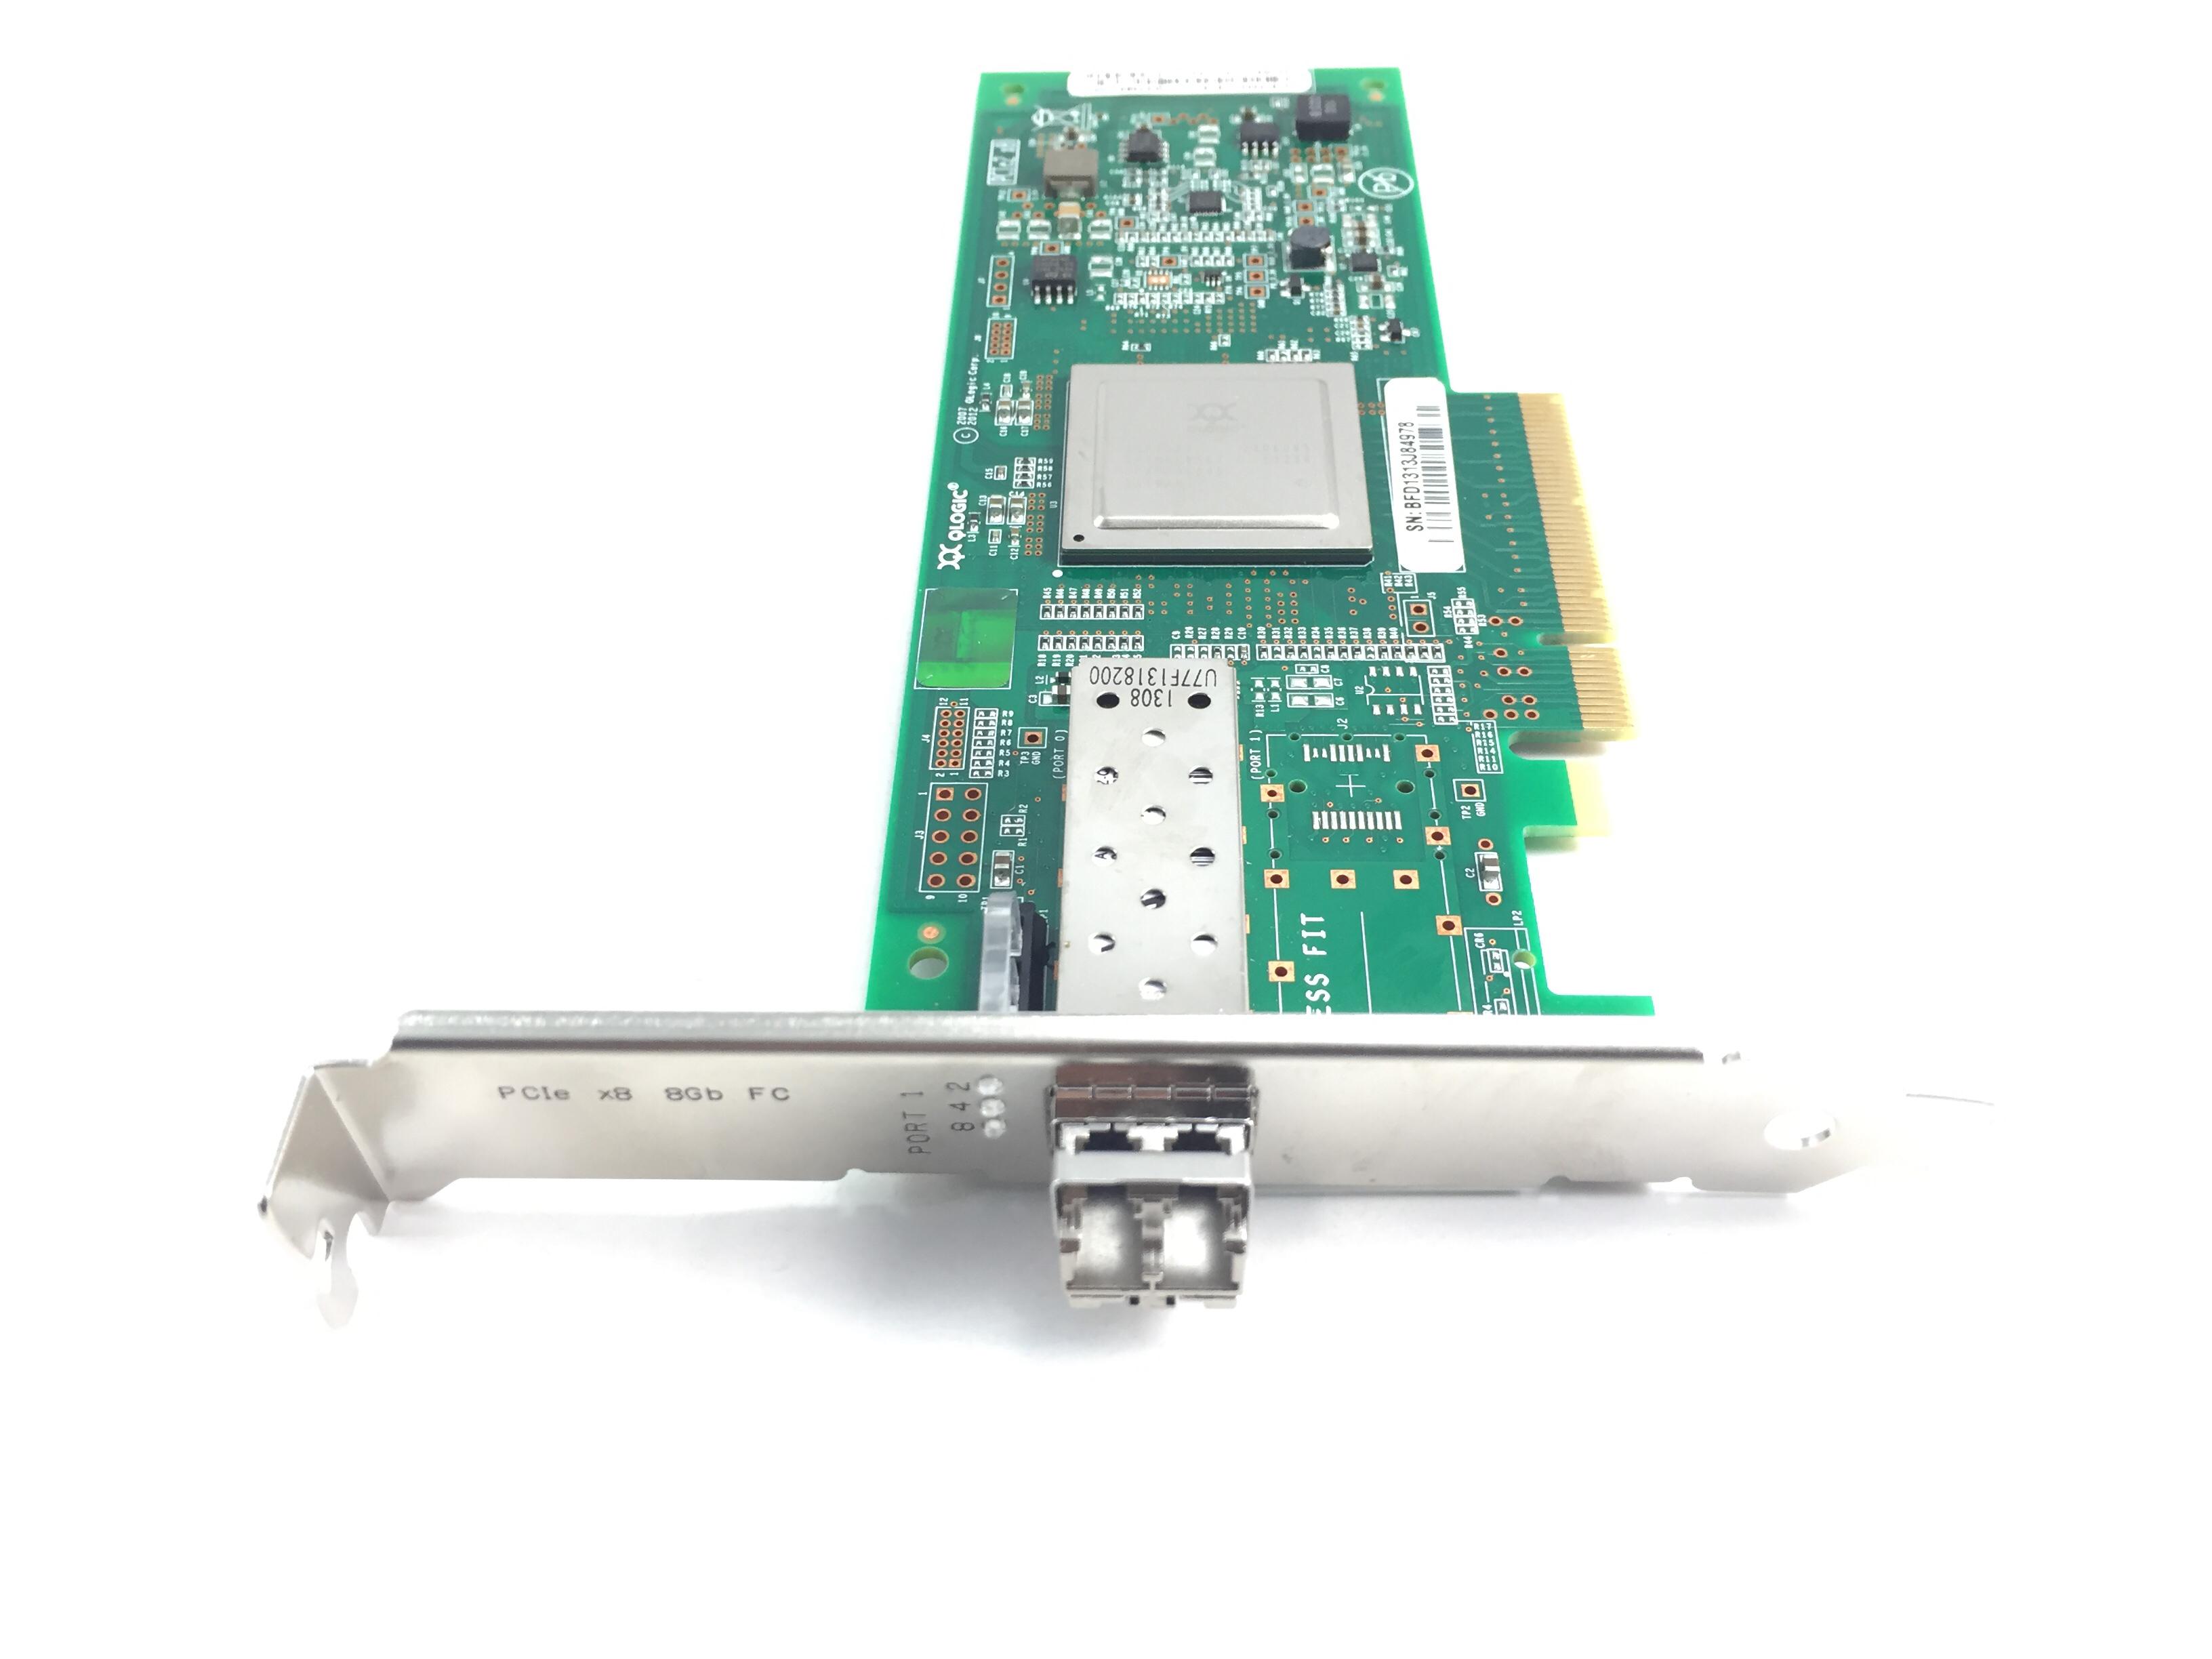 DELL QLOGIC QLE2560 8GB/S SINGLE PORT FIBER CHANNEL HOST BUS ADAPTER (R1N53)